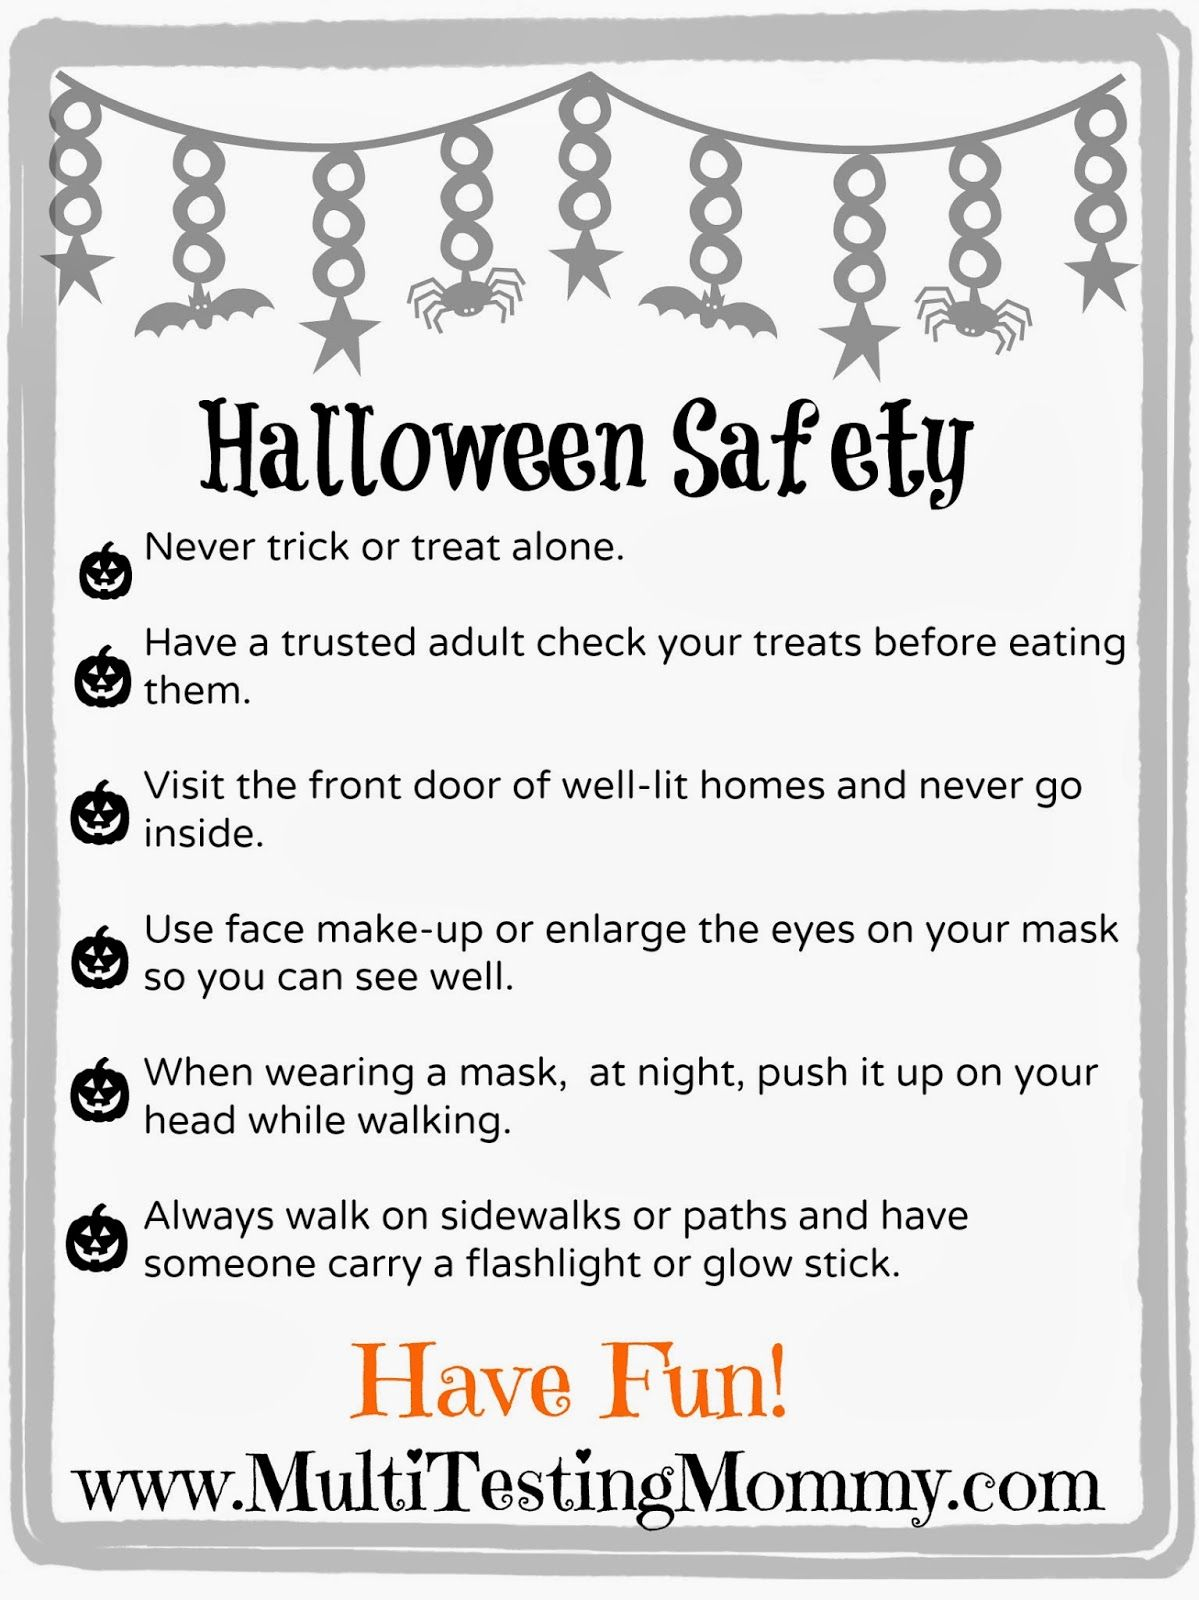 Halloween Safety Tips for Kids {Printable Halloween